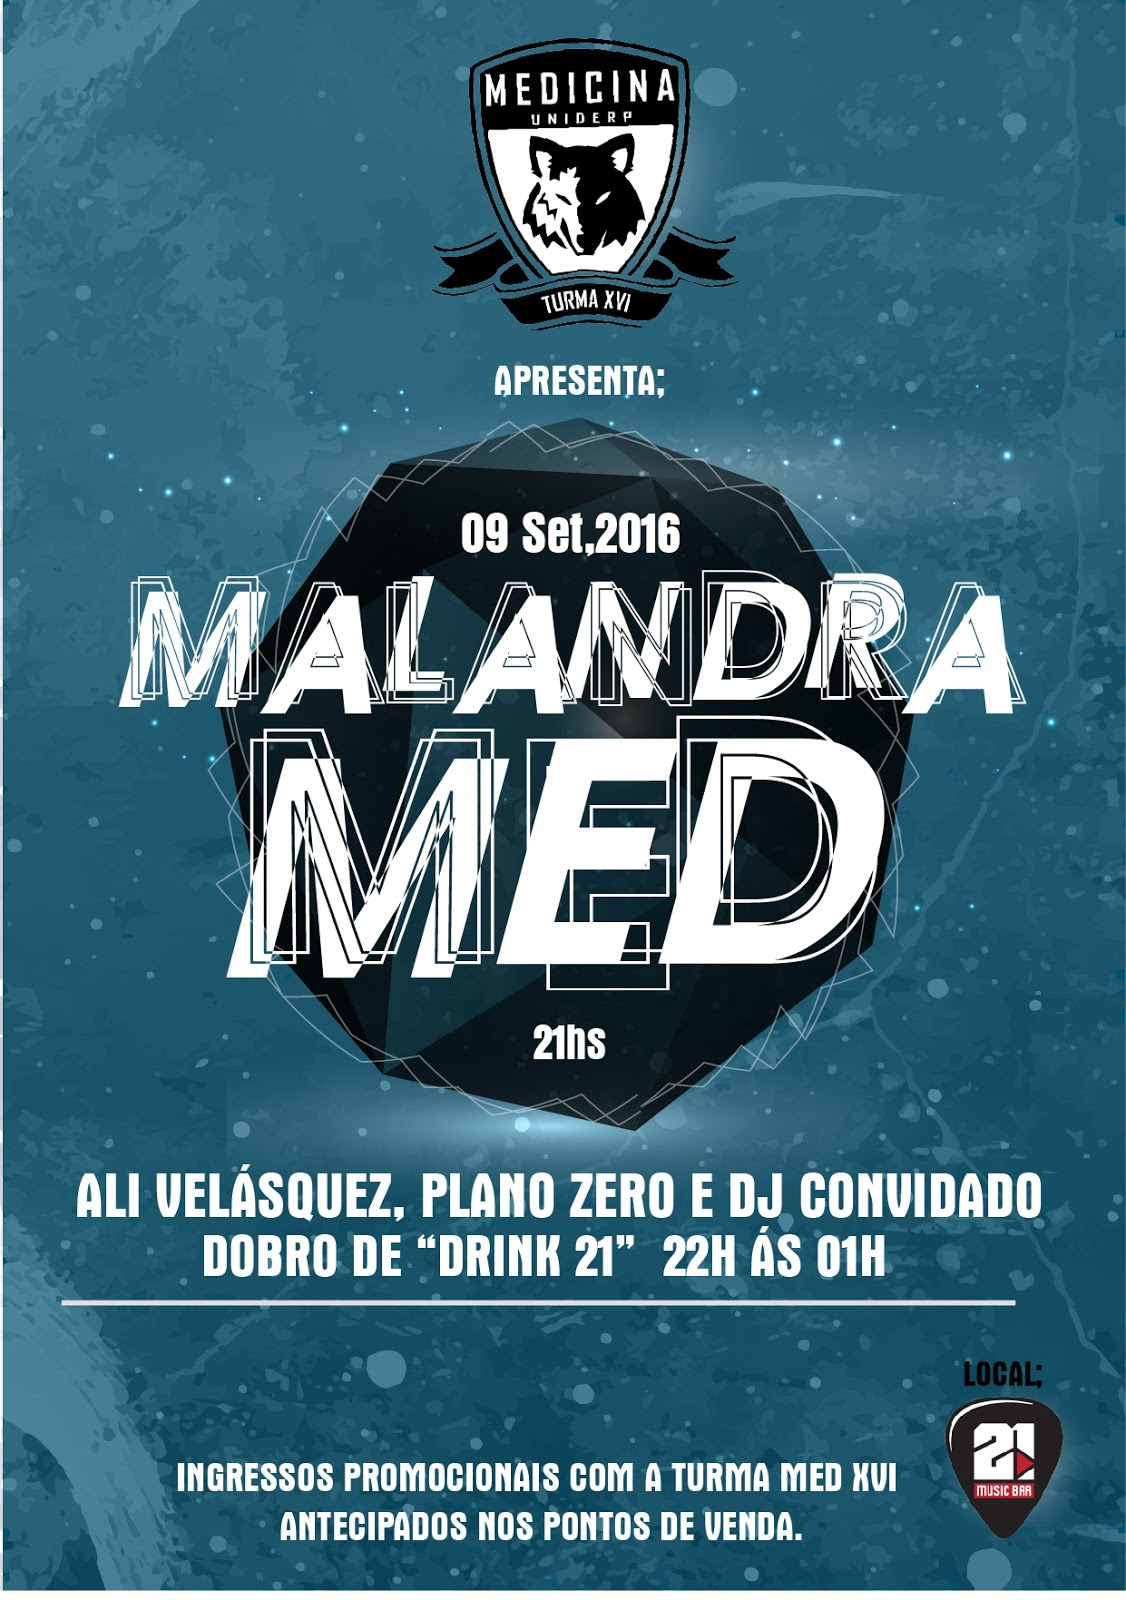 Well-known FLYER PARA FESTA DA MEDICINA UNIDERP - Like Marketing Digital QM15